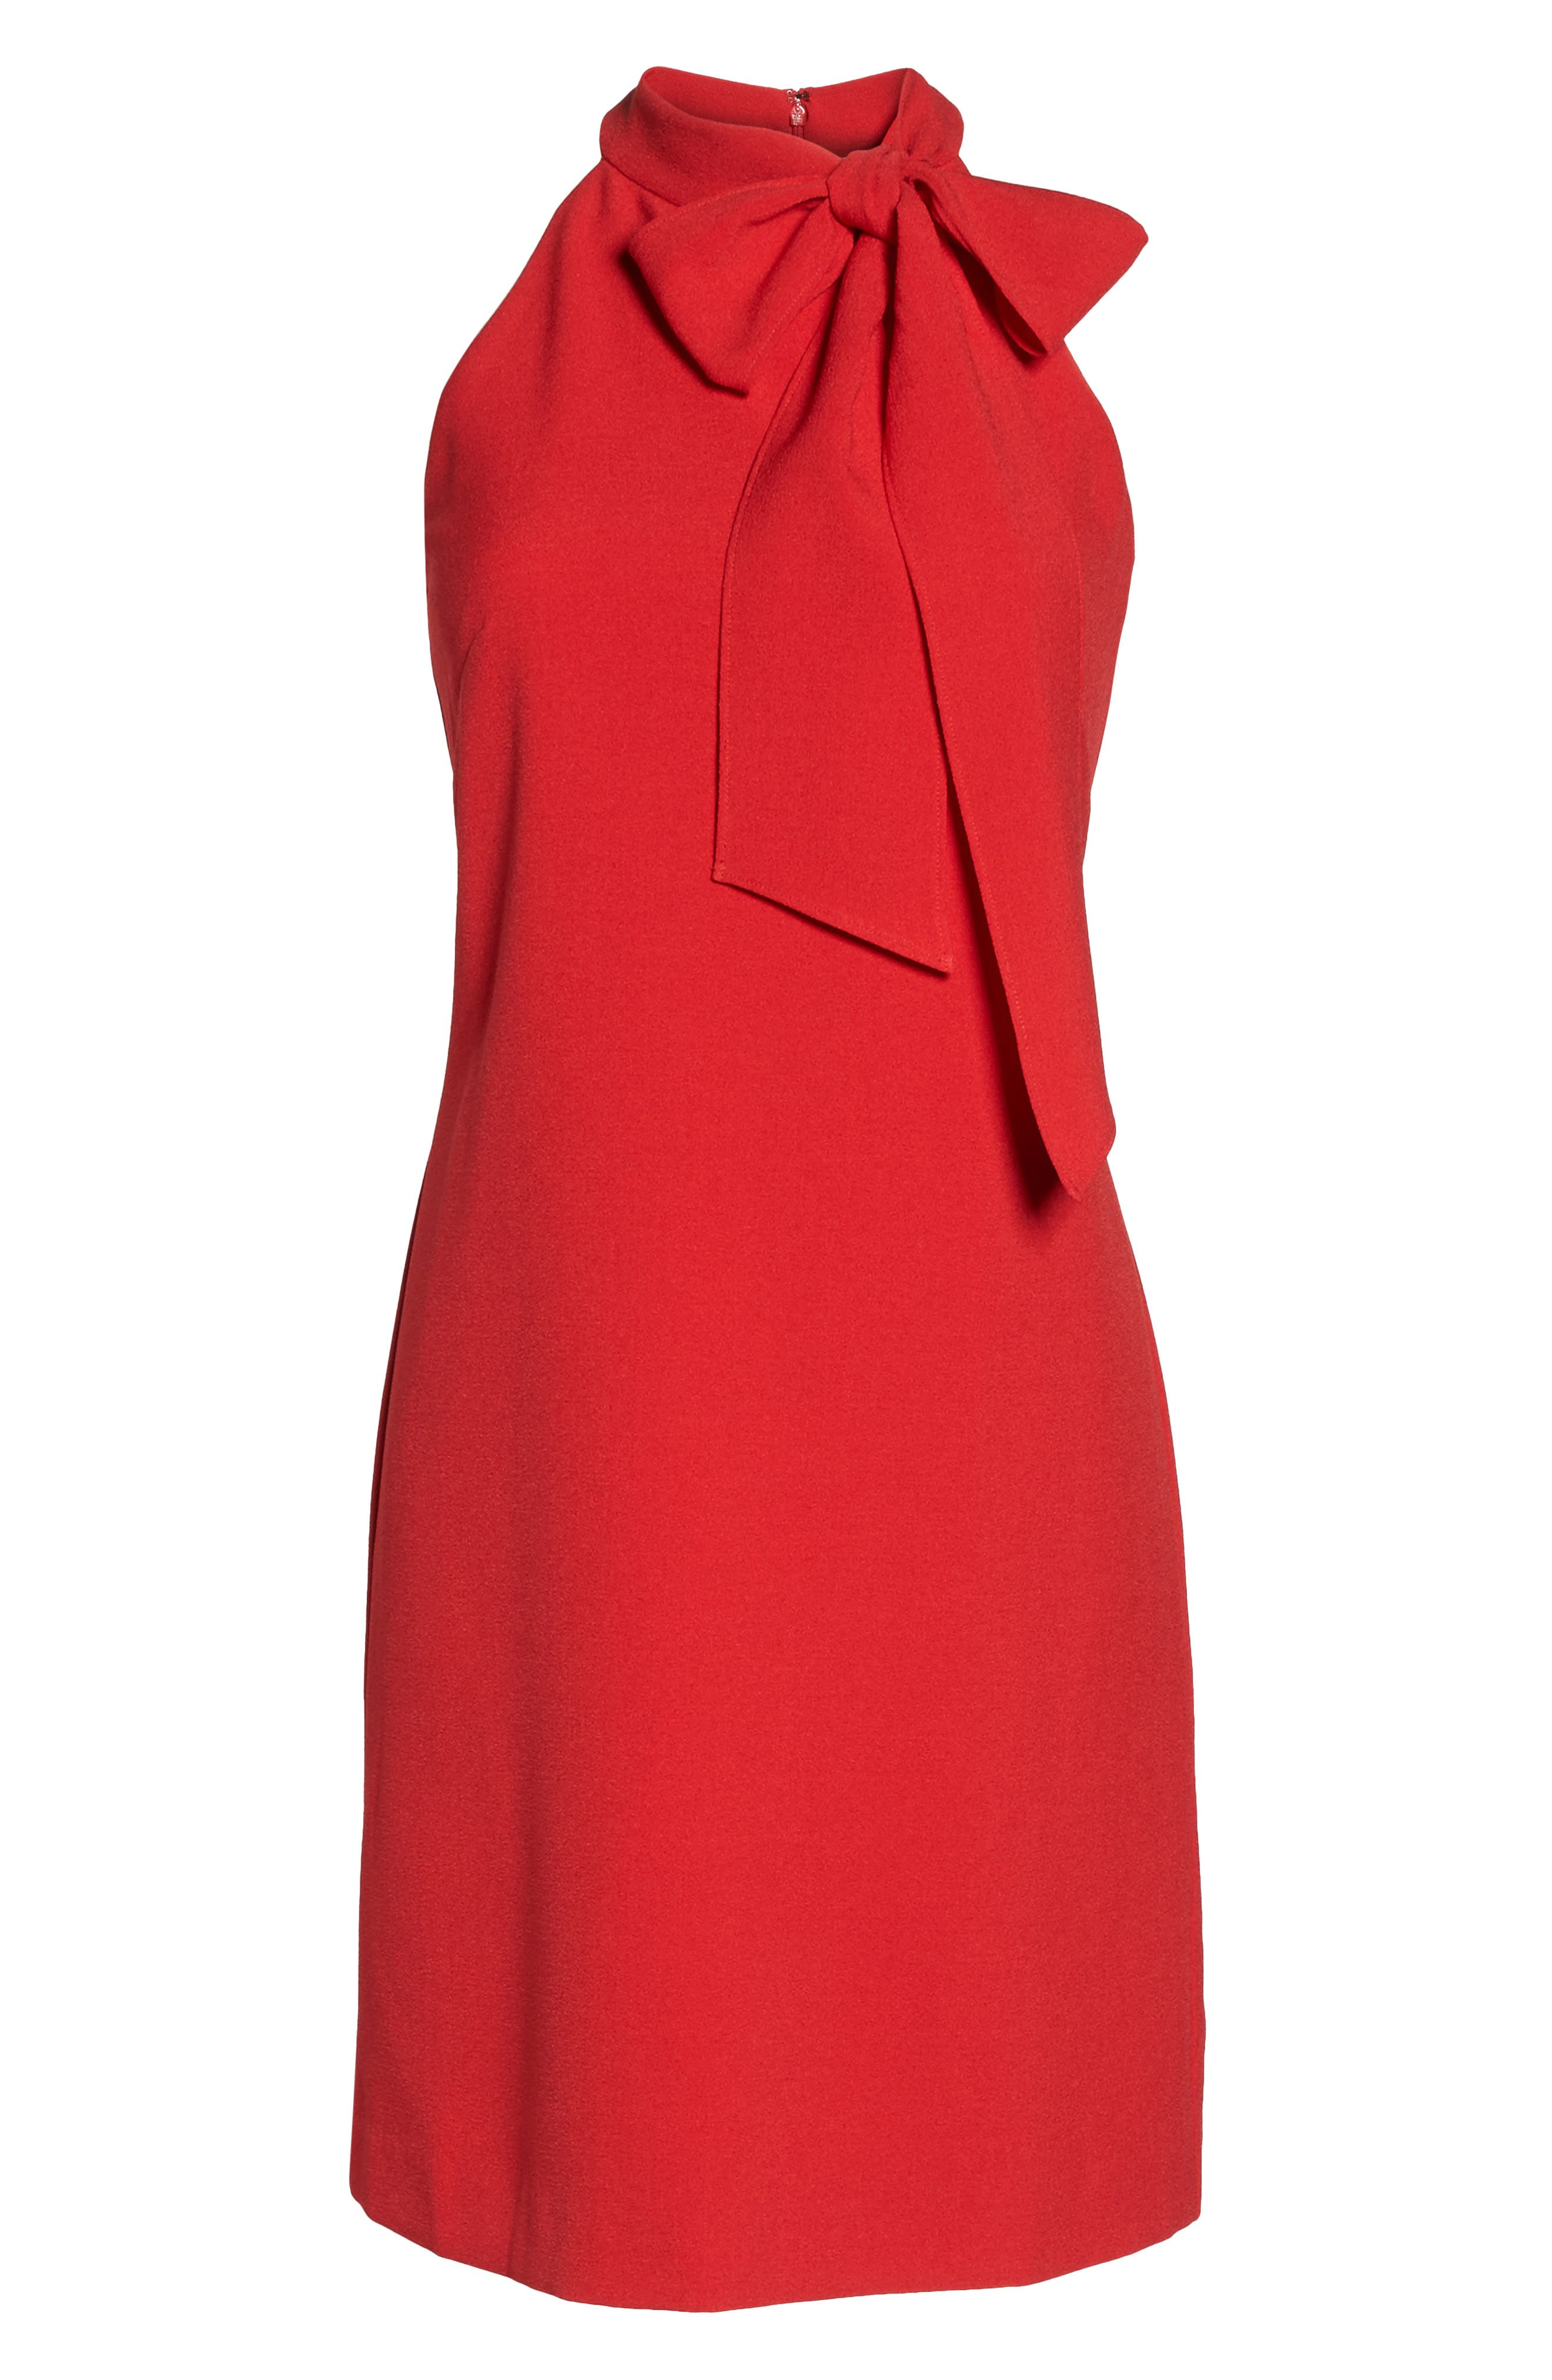 VINCE CAMUTO, Halter Tie Neck A-Line Dress, Alternate thumbnail 8, color, RED